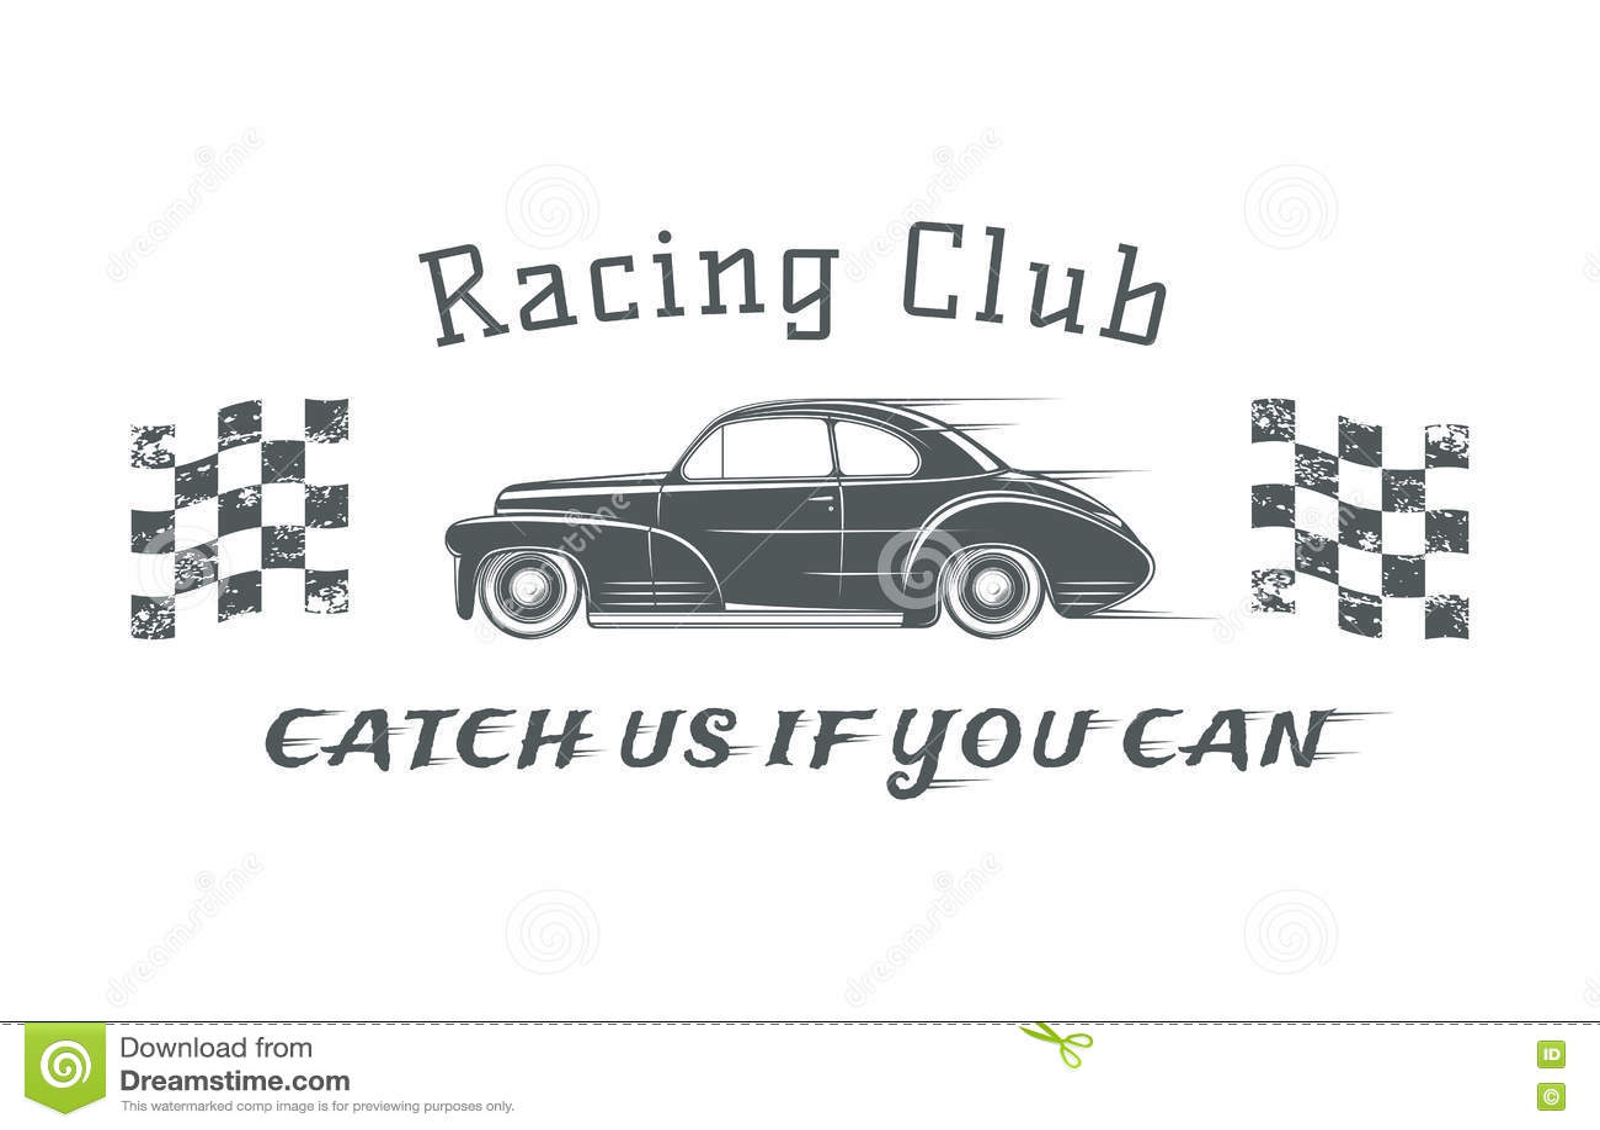 Vintage Racing Club Badge Template Stock Vector